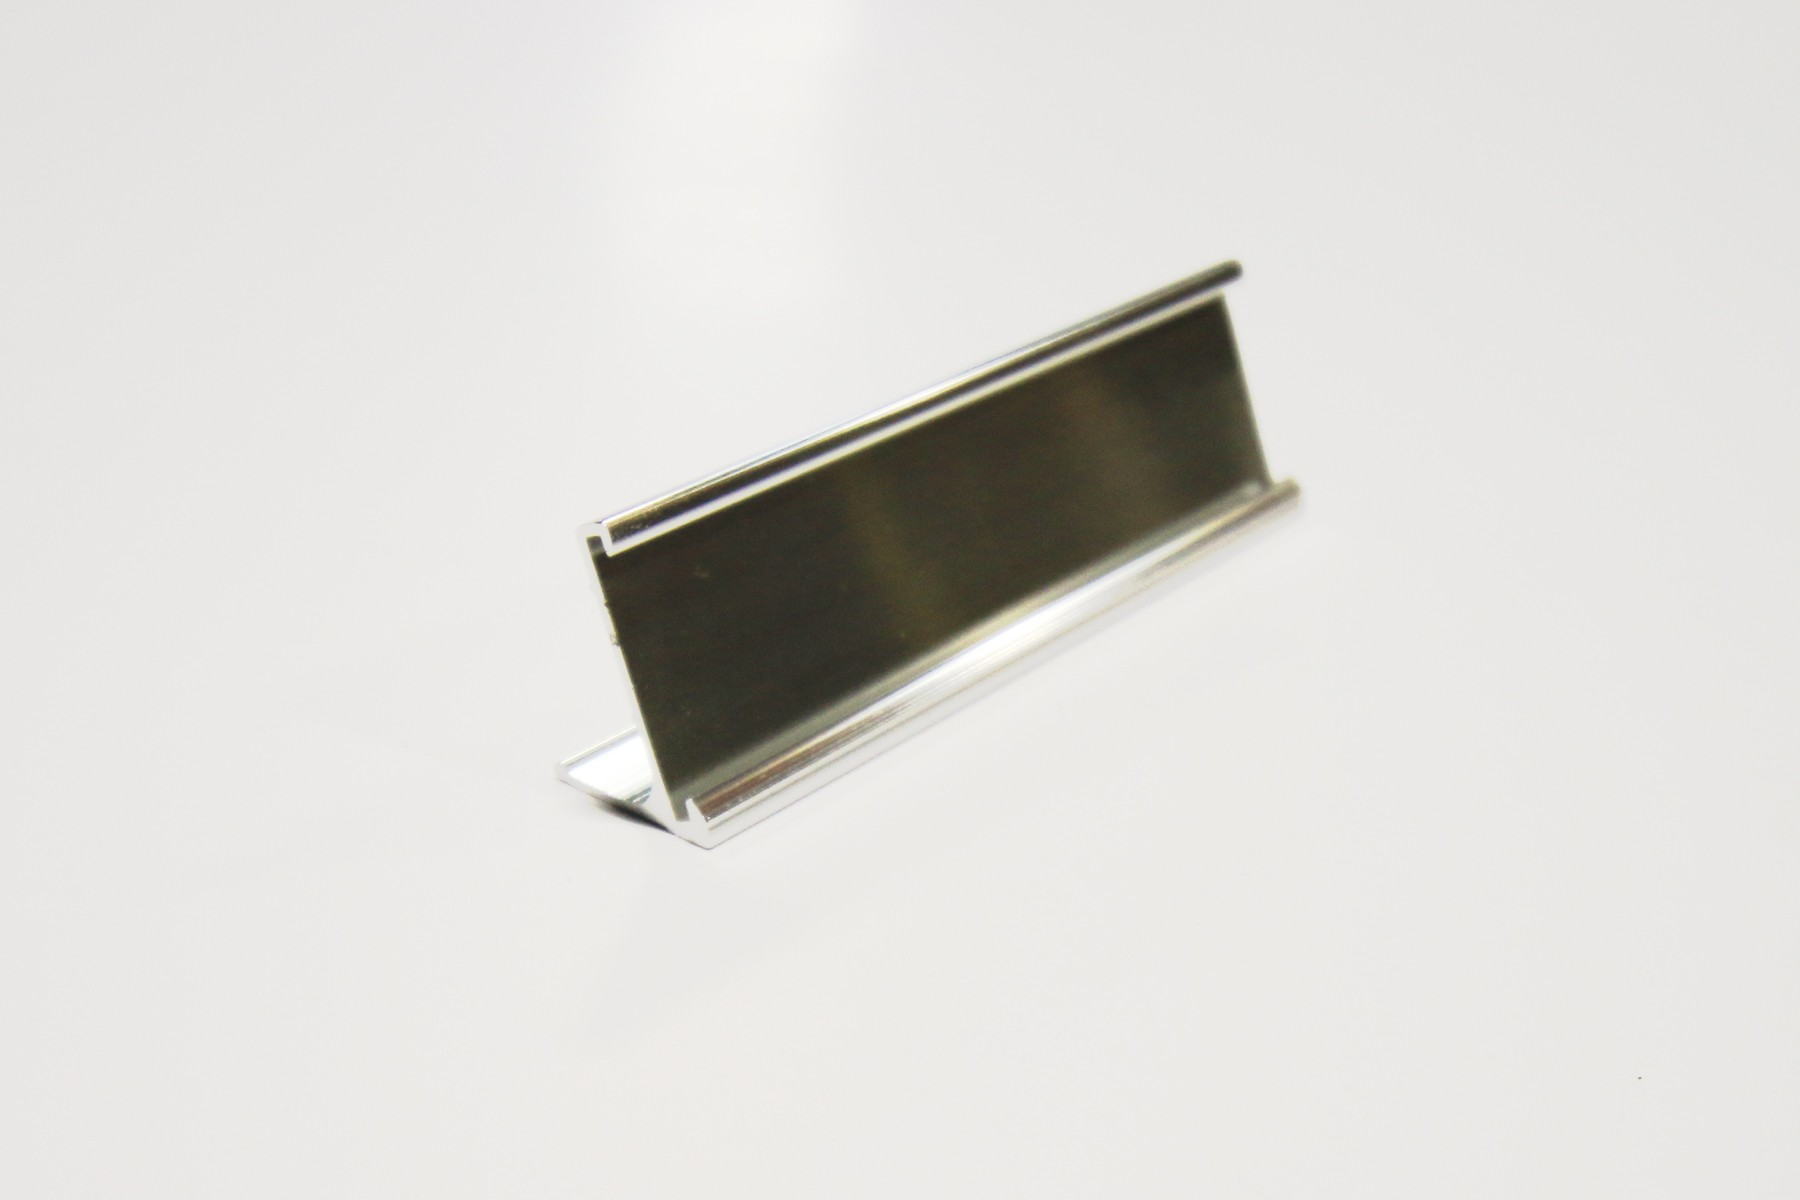 1 x 4 Desk Holder, Silver